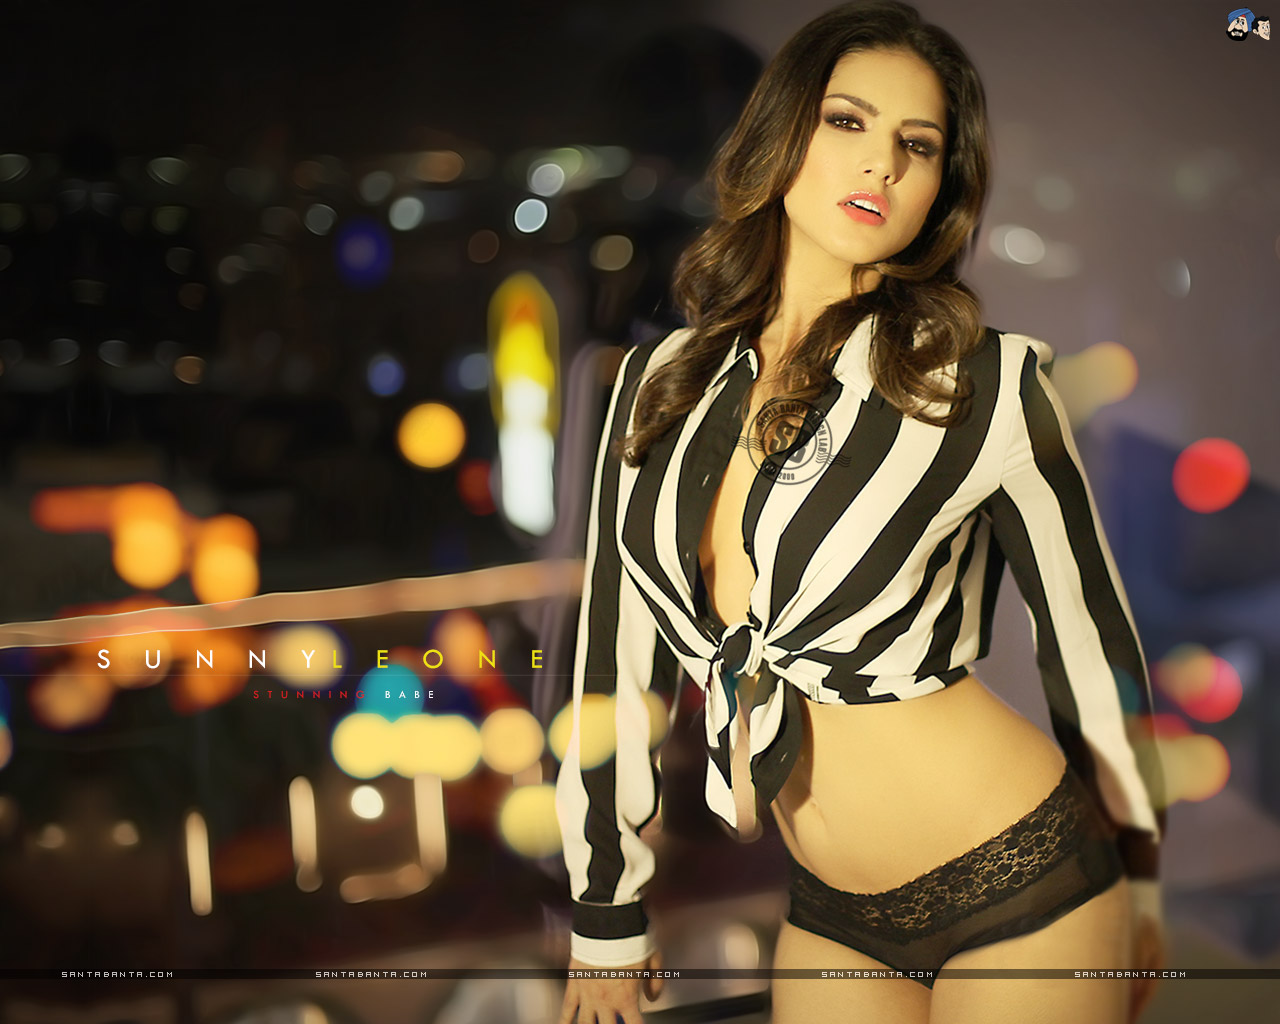 Beautiful Girl Wallpaper Santa Banta Sunny Leone Hd Wallpapers Most Beautiful Places In The